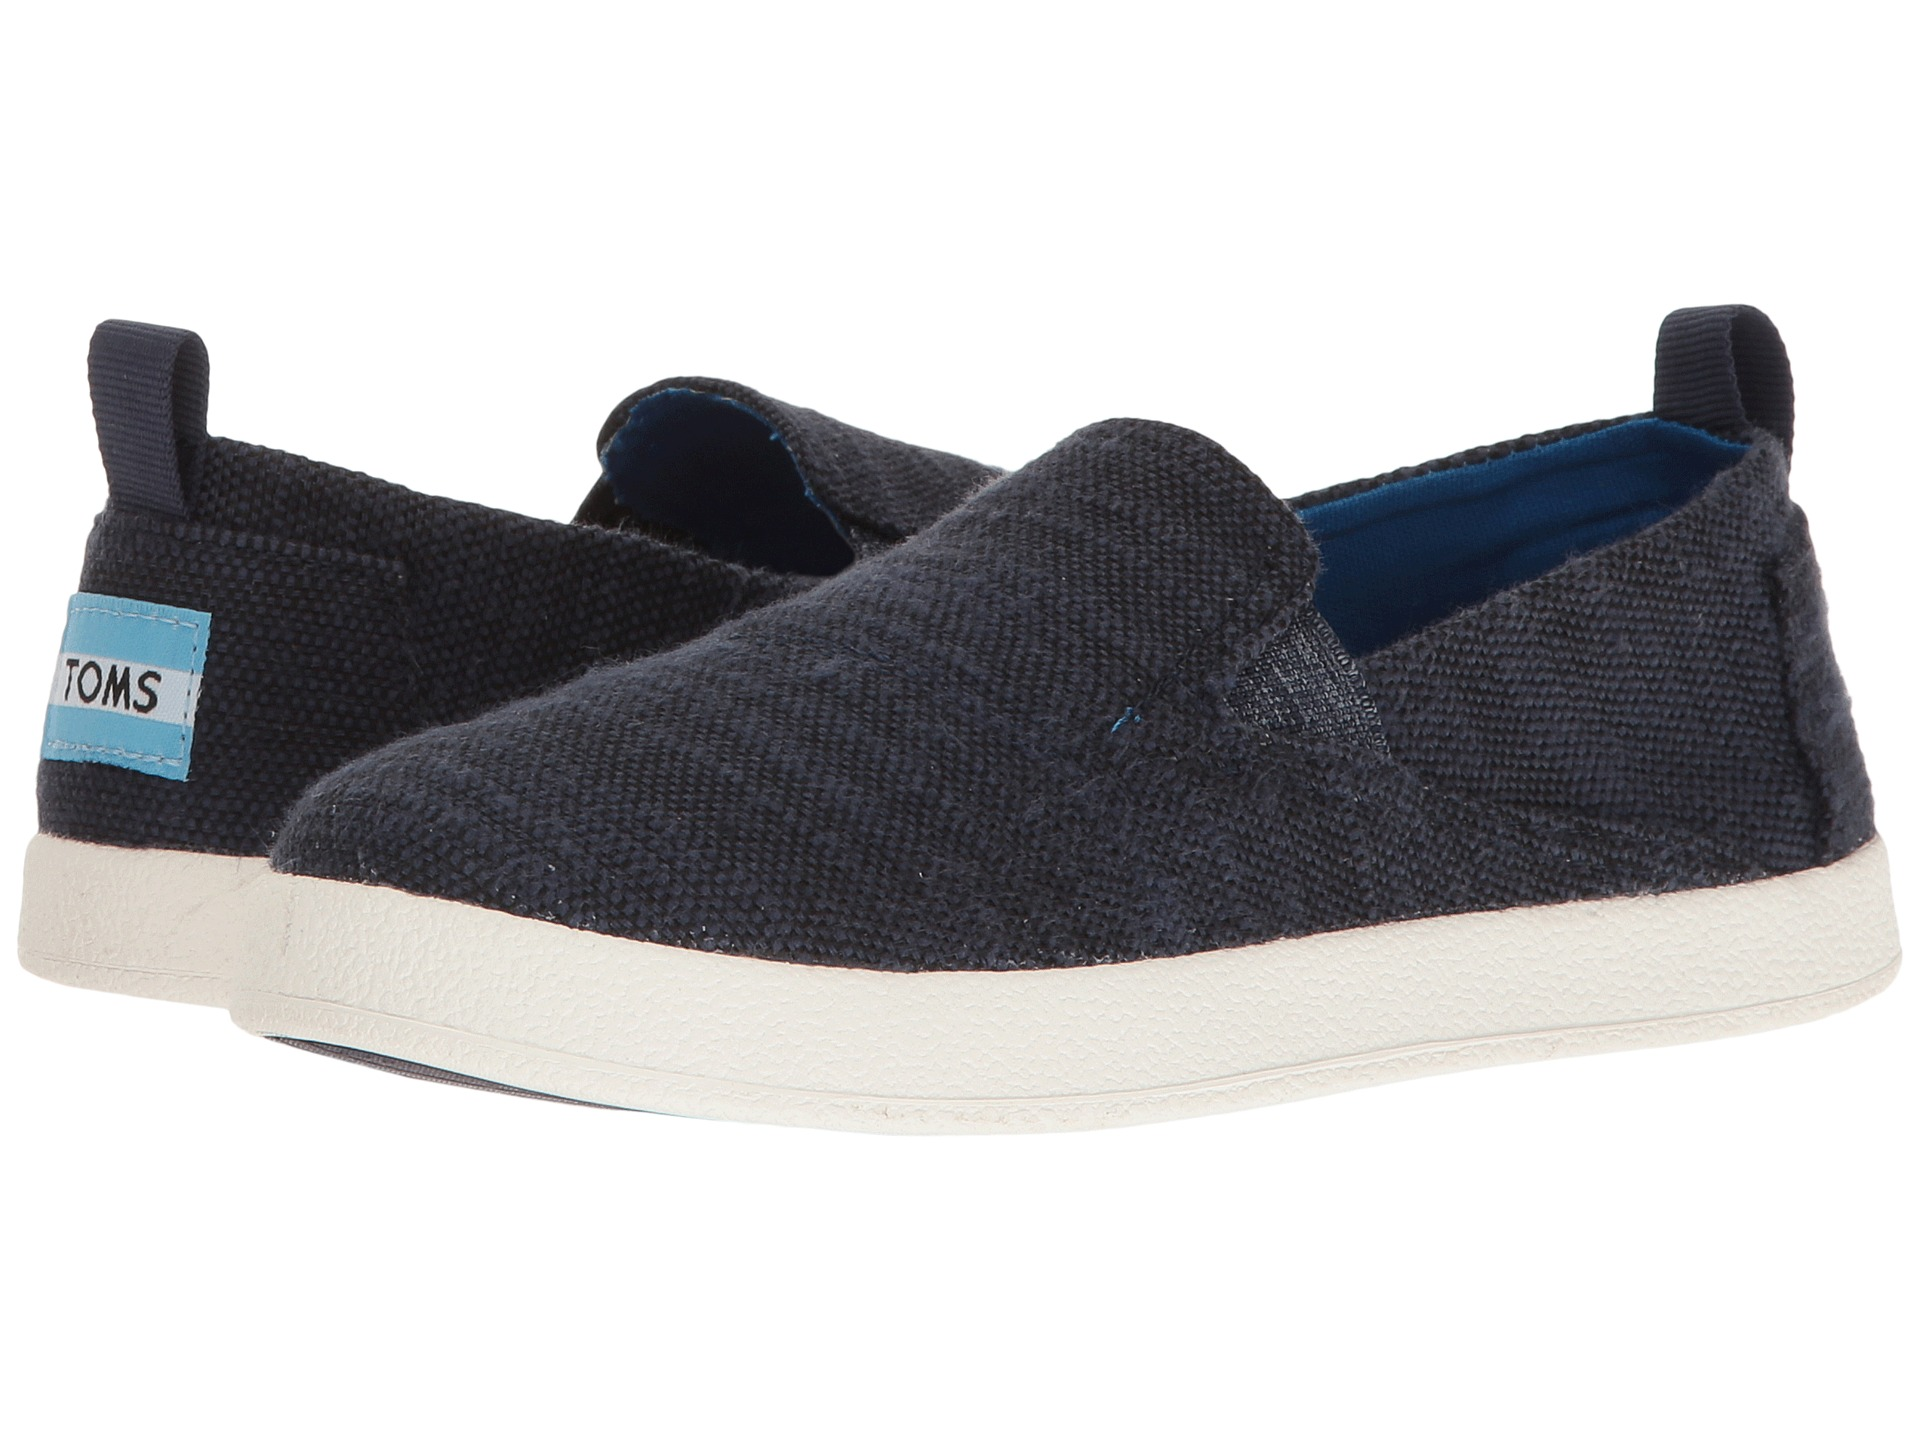 Toms Avalon Kid Shoes